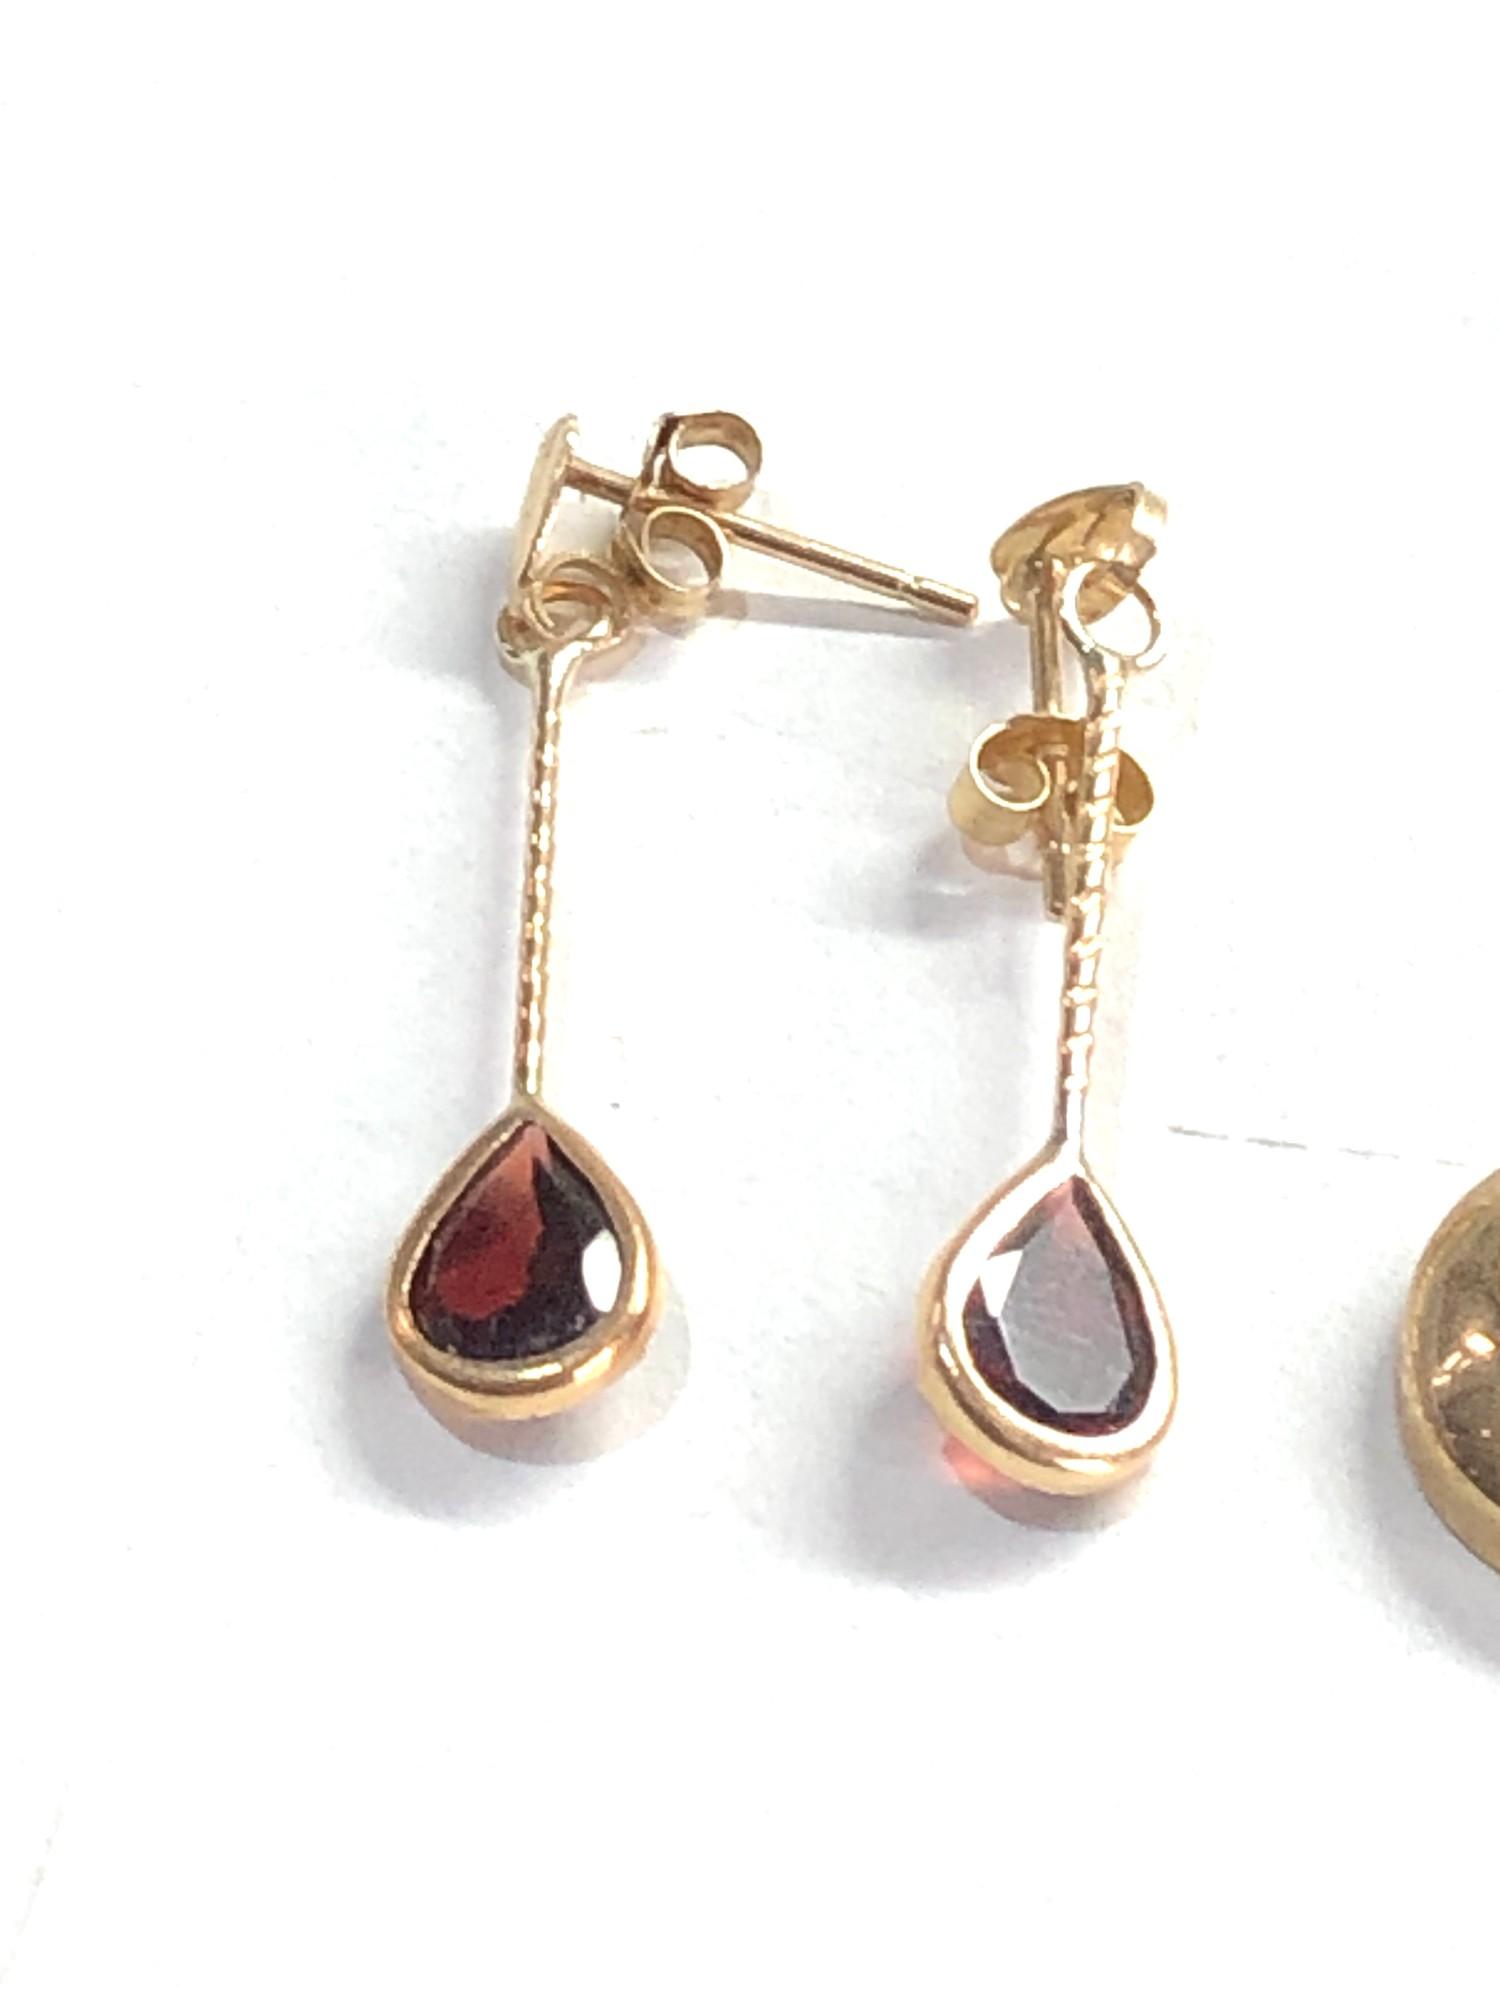 3 x 9ct garnet earrings 5g - Image 2 of 3